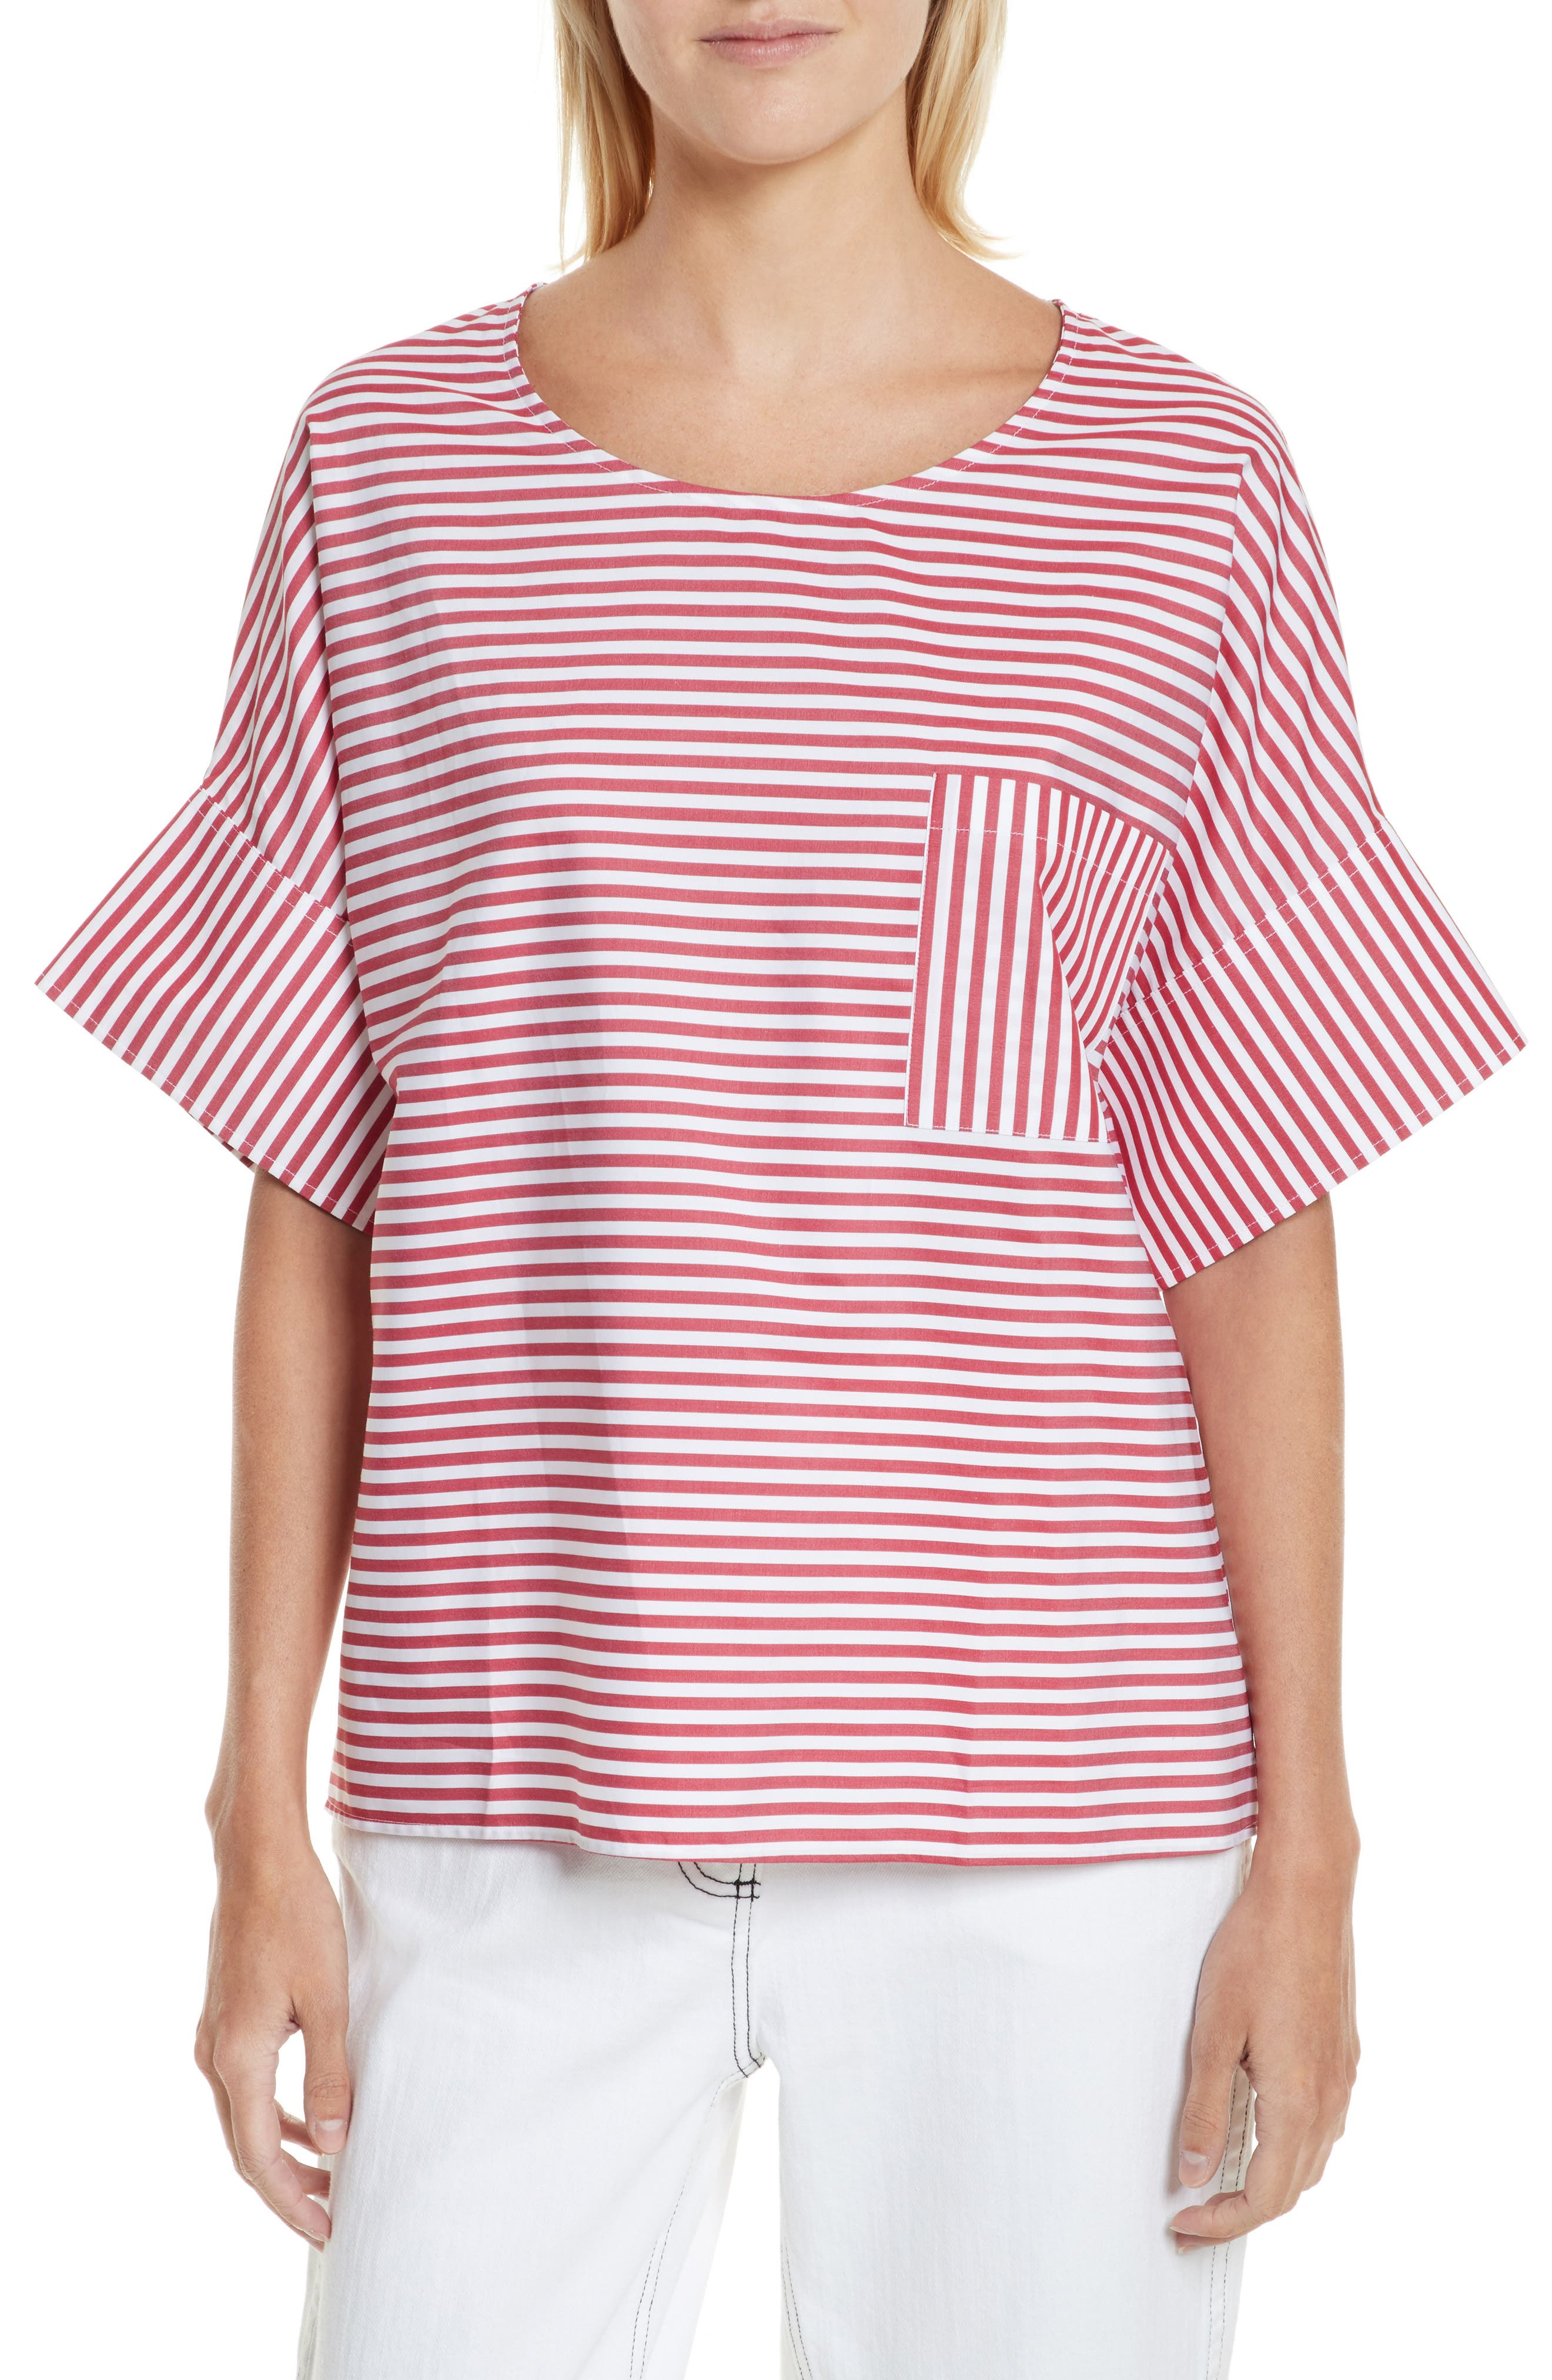 Amos Stripe Top,                         Main,                         color, Red Stripe